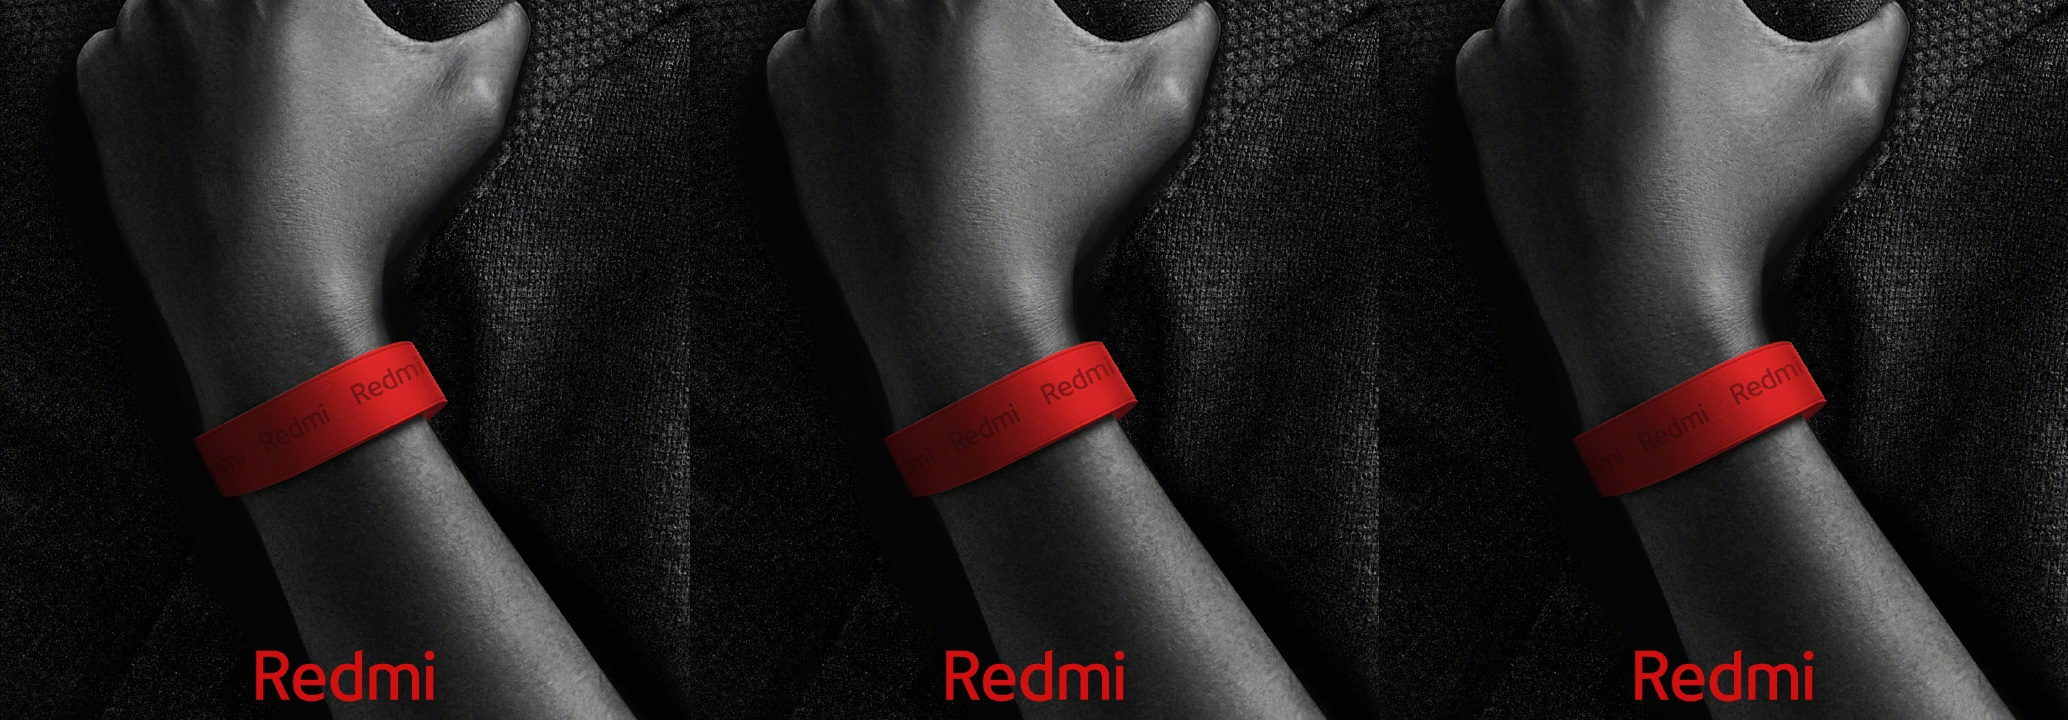 Redmi Band teaser